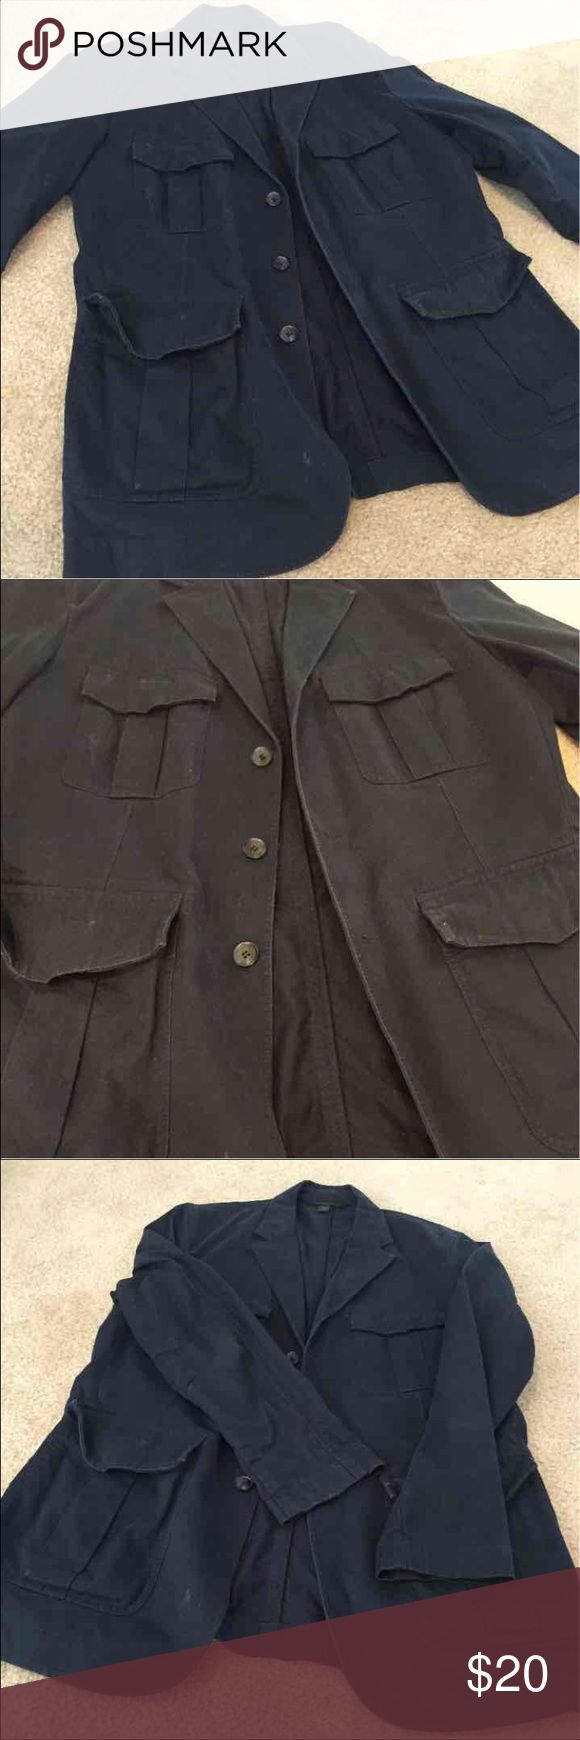 Men's dress coat Navy color. Double breasted blazer. Size says 38R, fits a Medium/Large Express Jackets & Coats Pea Coats